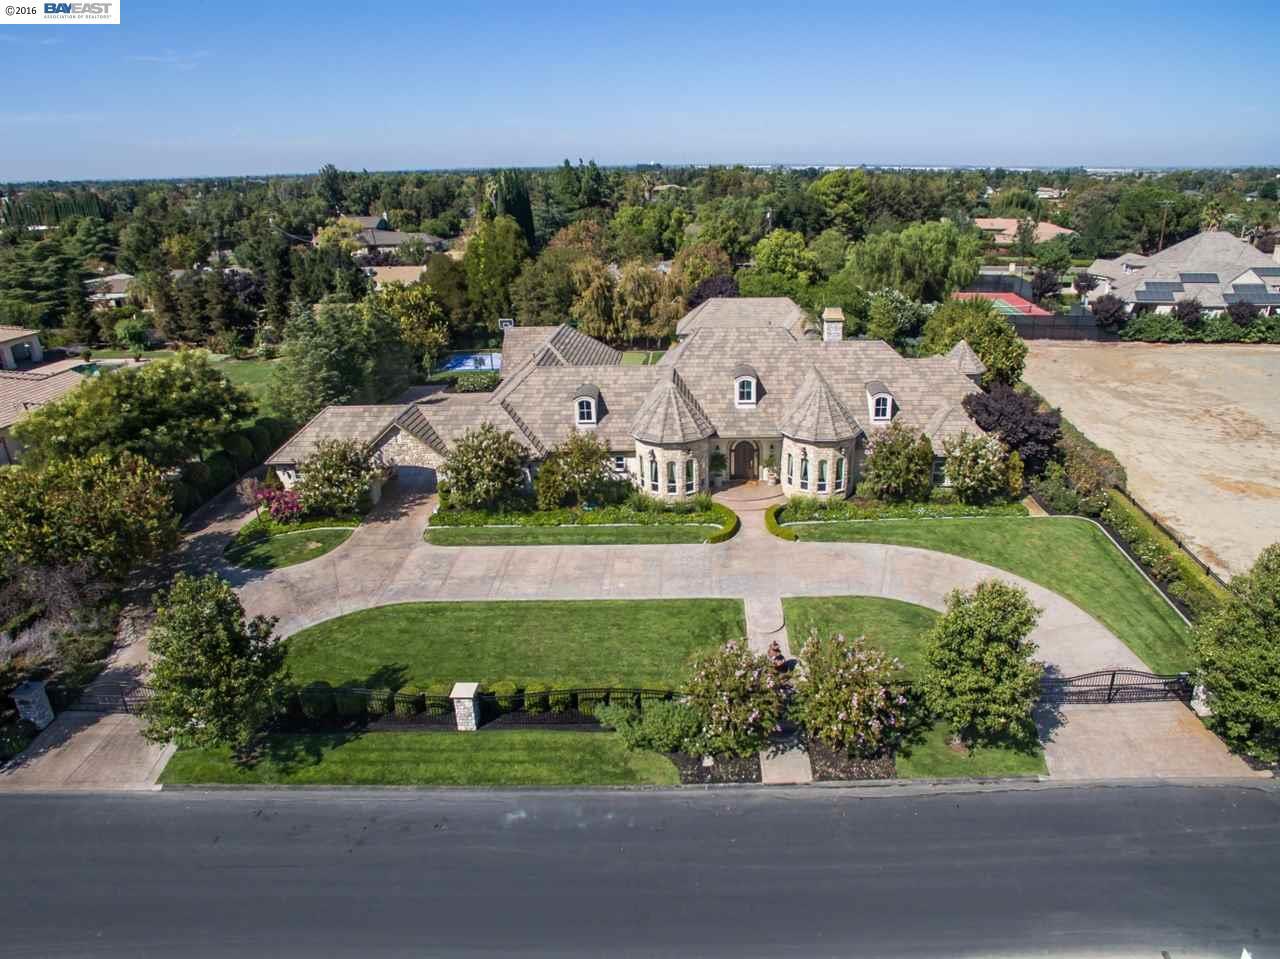 8545 Ranch Rd, Tracy, CA 95304